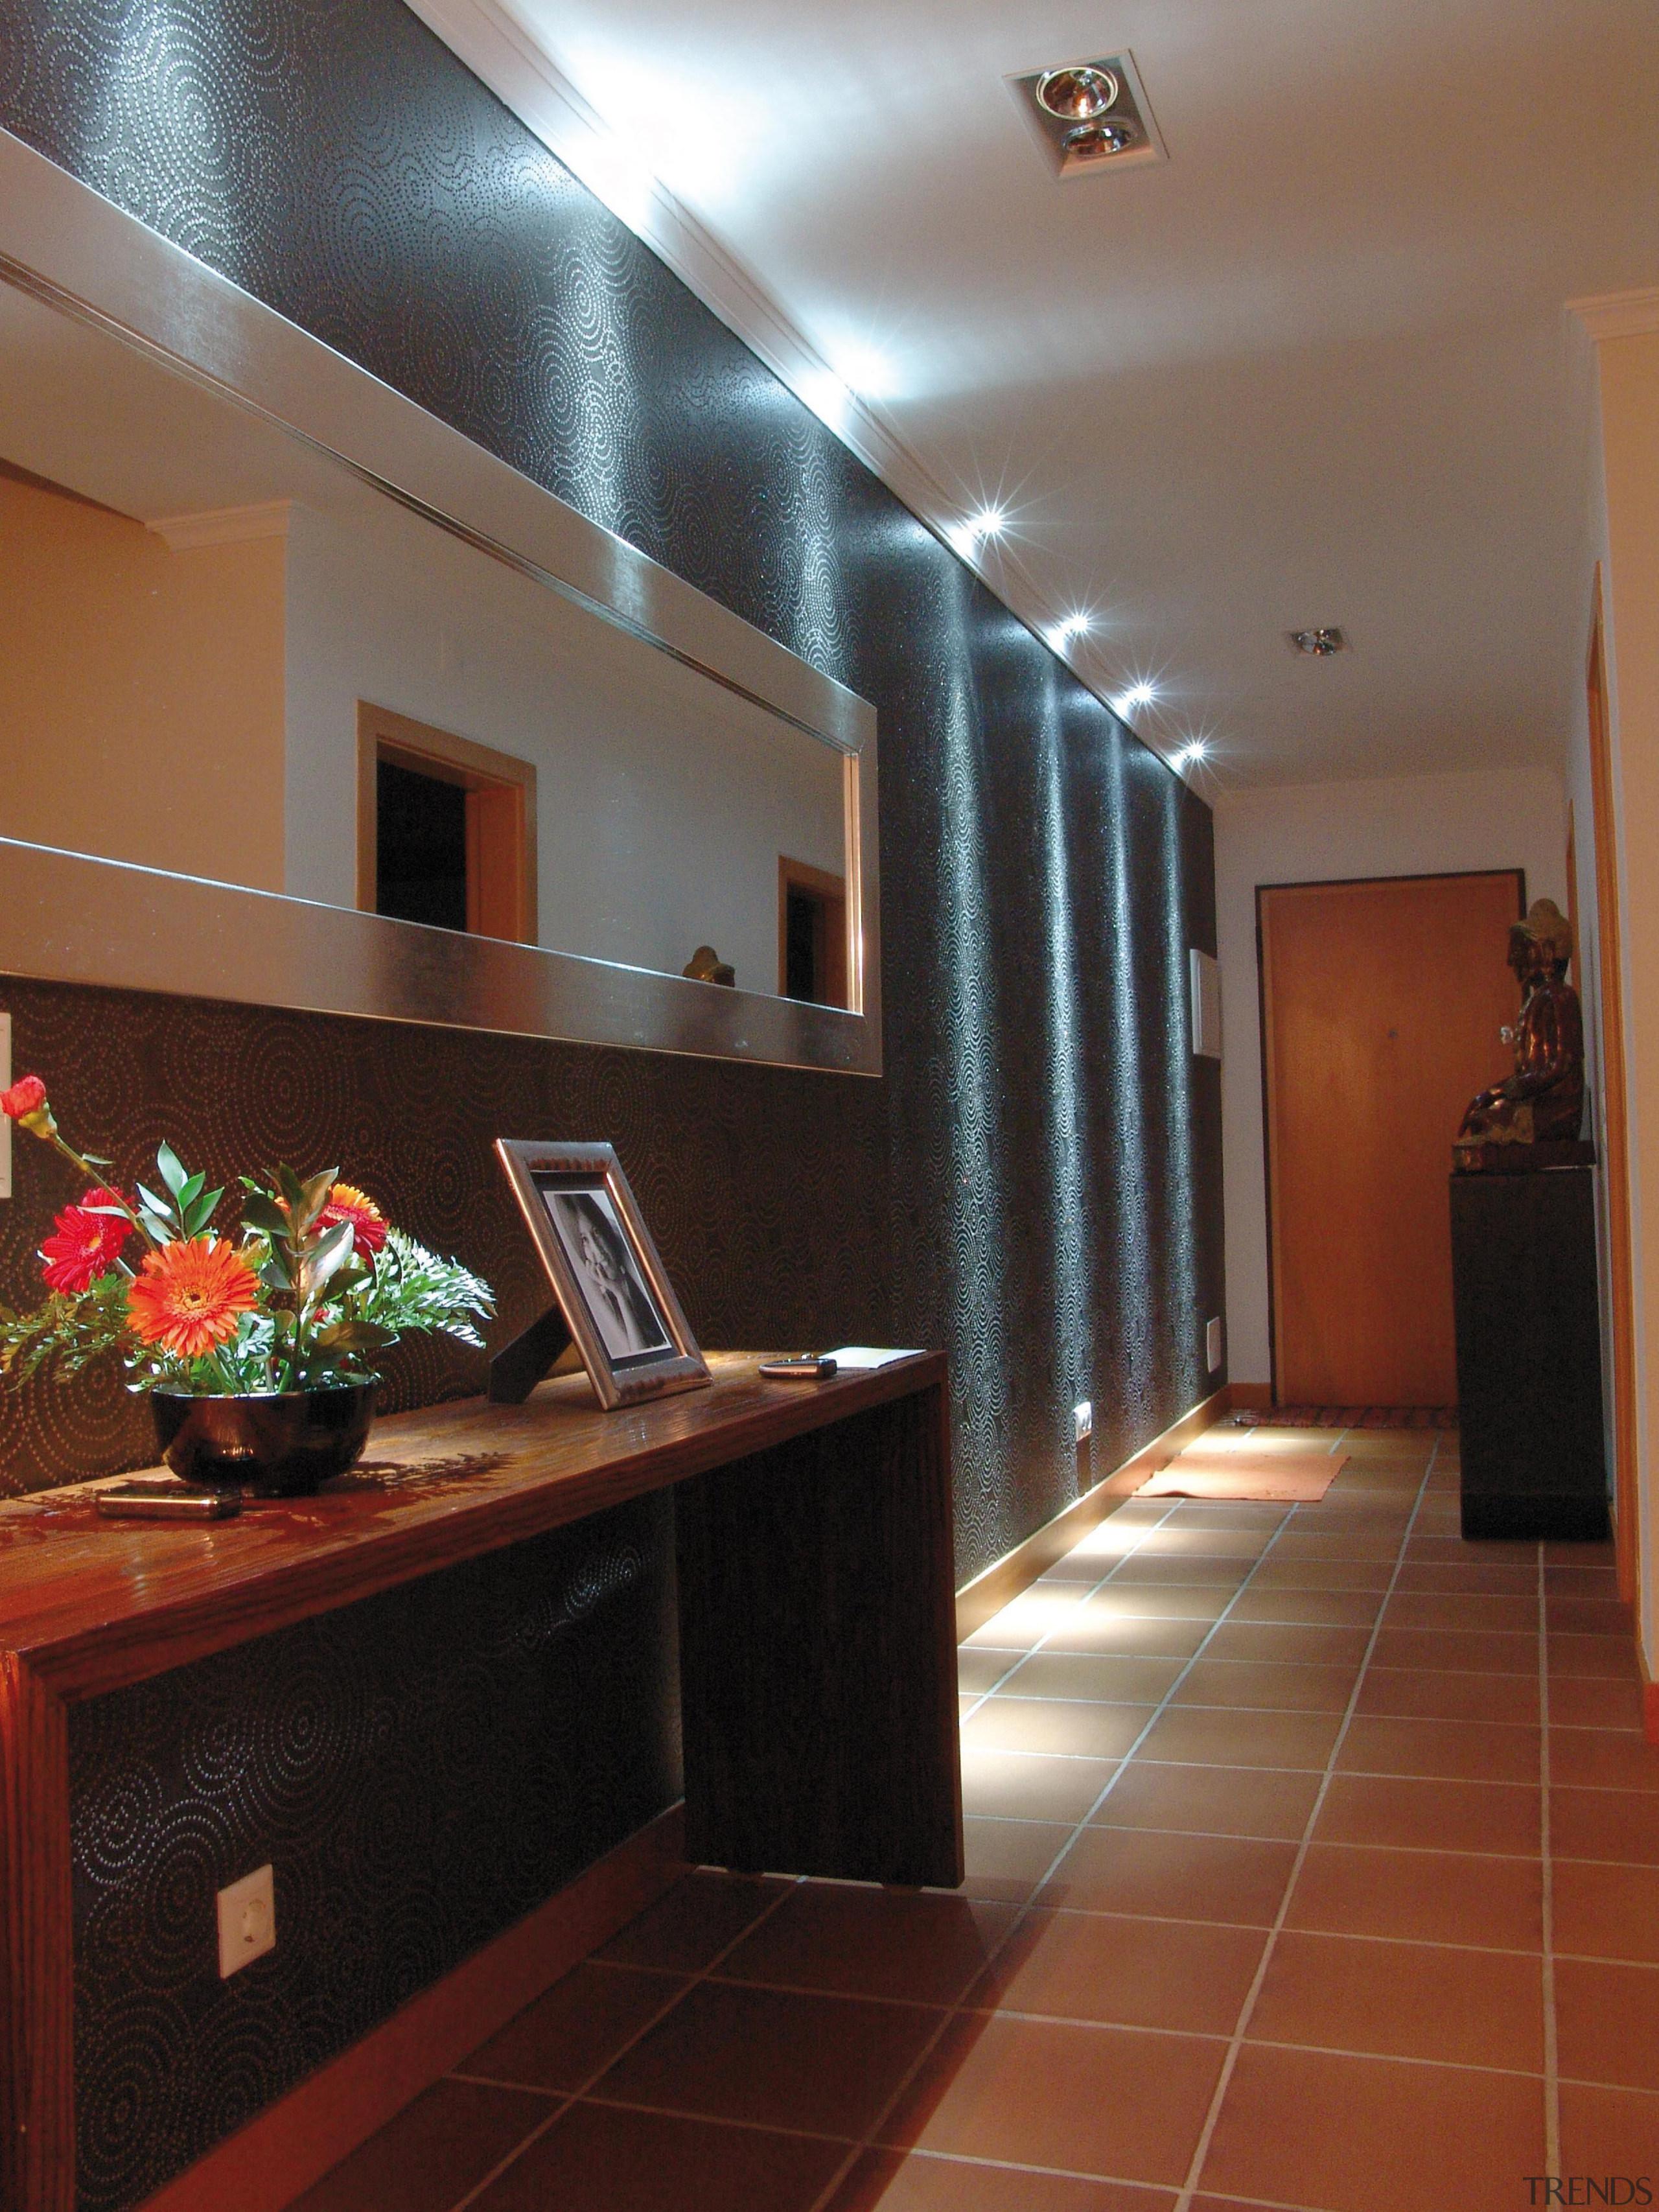 LED Lights - ceiling | floor | flooring ceiling, floor, flooring, home, interior design, lighting, lobby, room, wall, brown, red